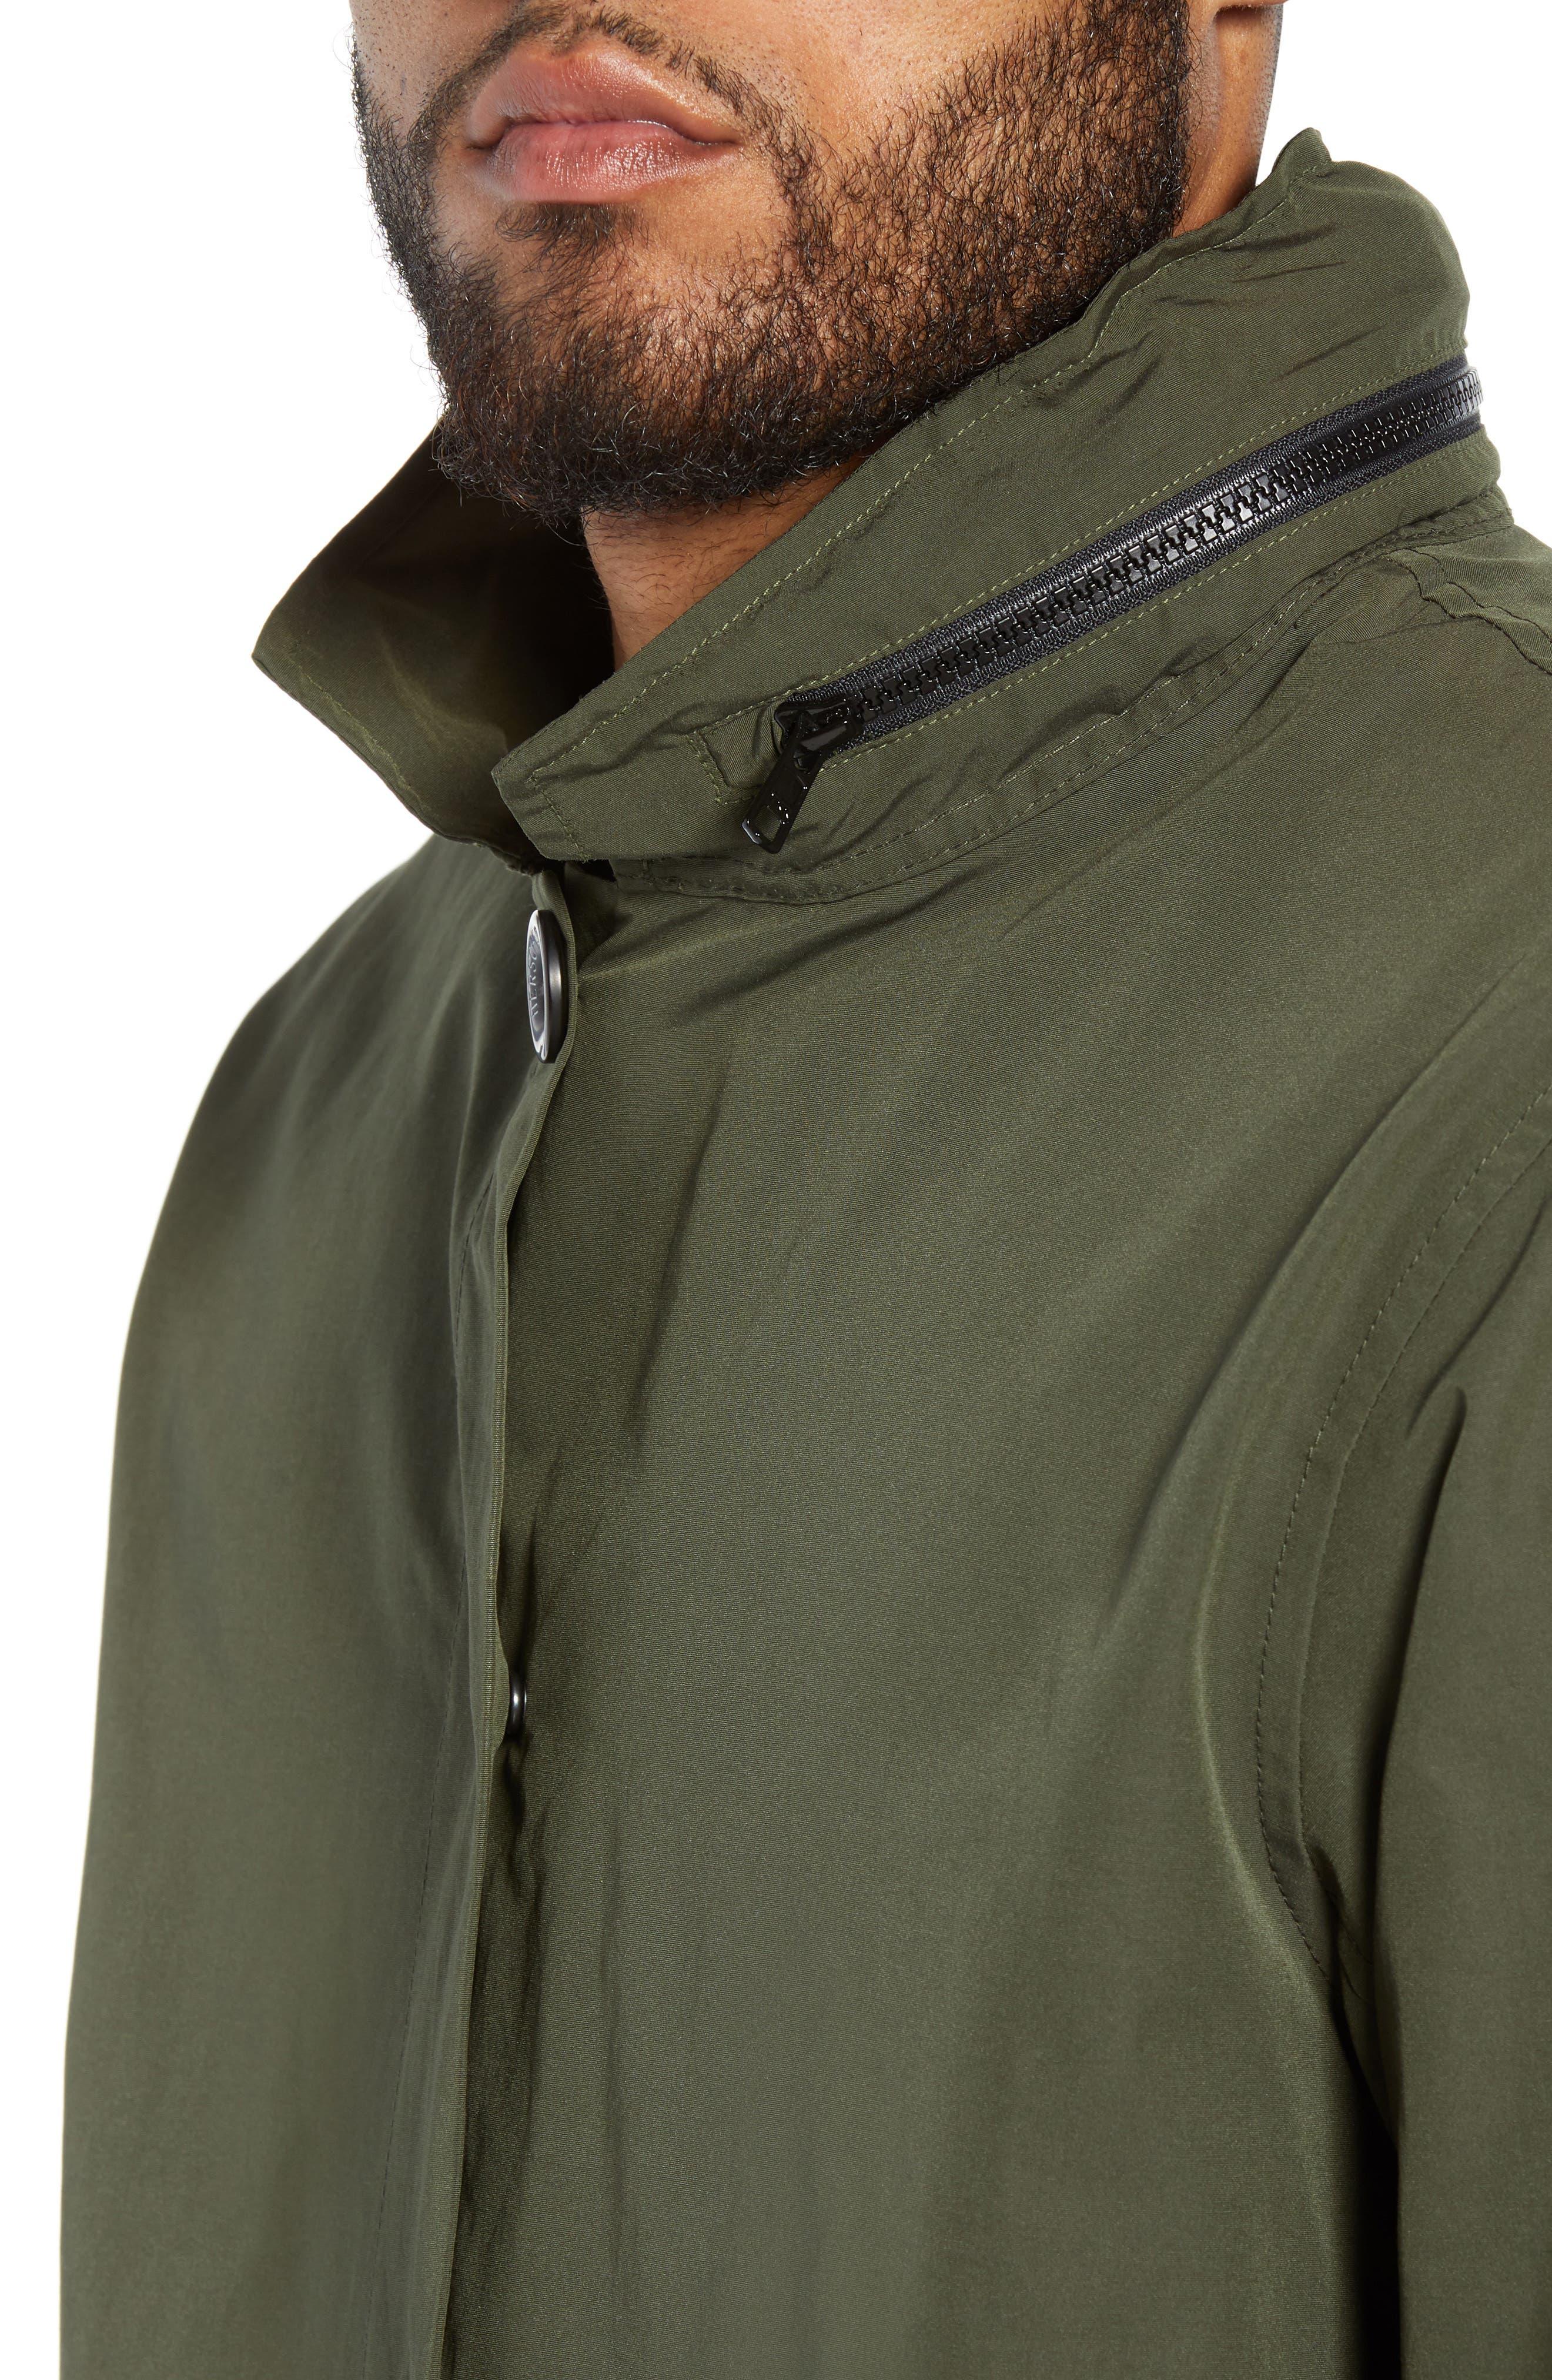 Stowaway Mac Jacket,                             Alternate thumbnail 4, color,                             306